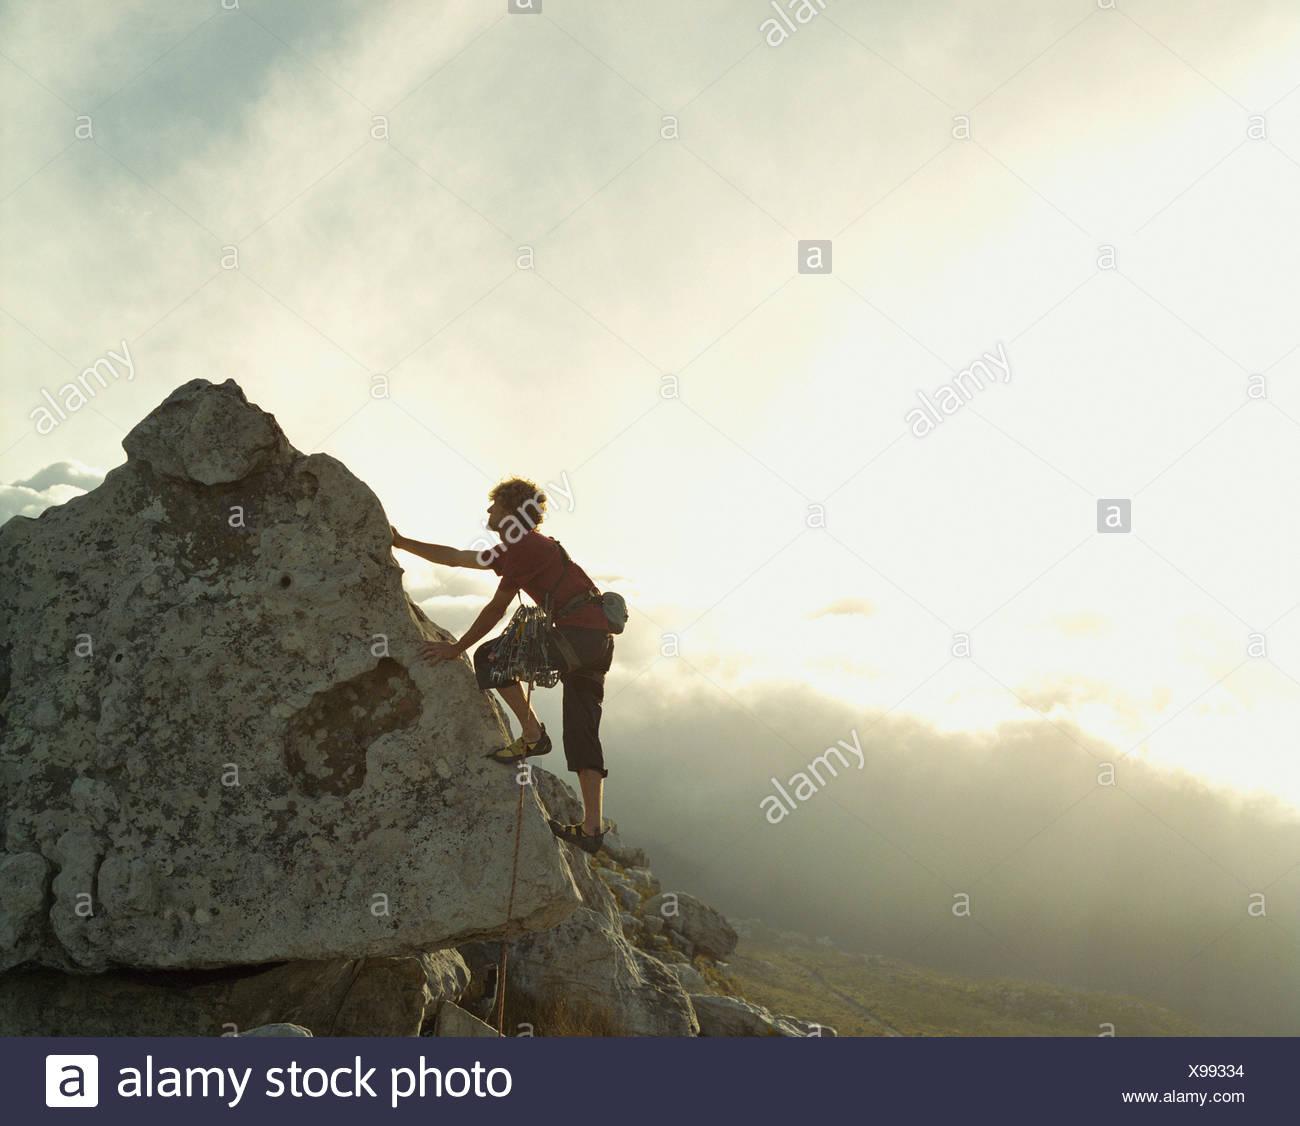 A mountain climber reaching the top of a mountain - Stock Image